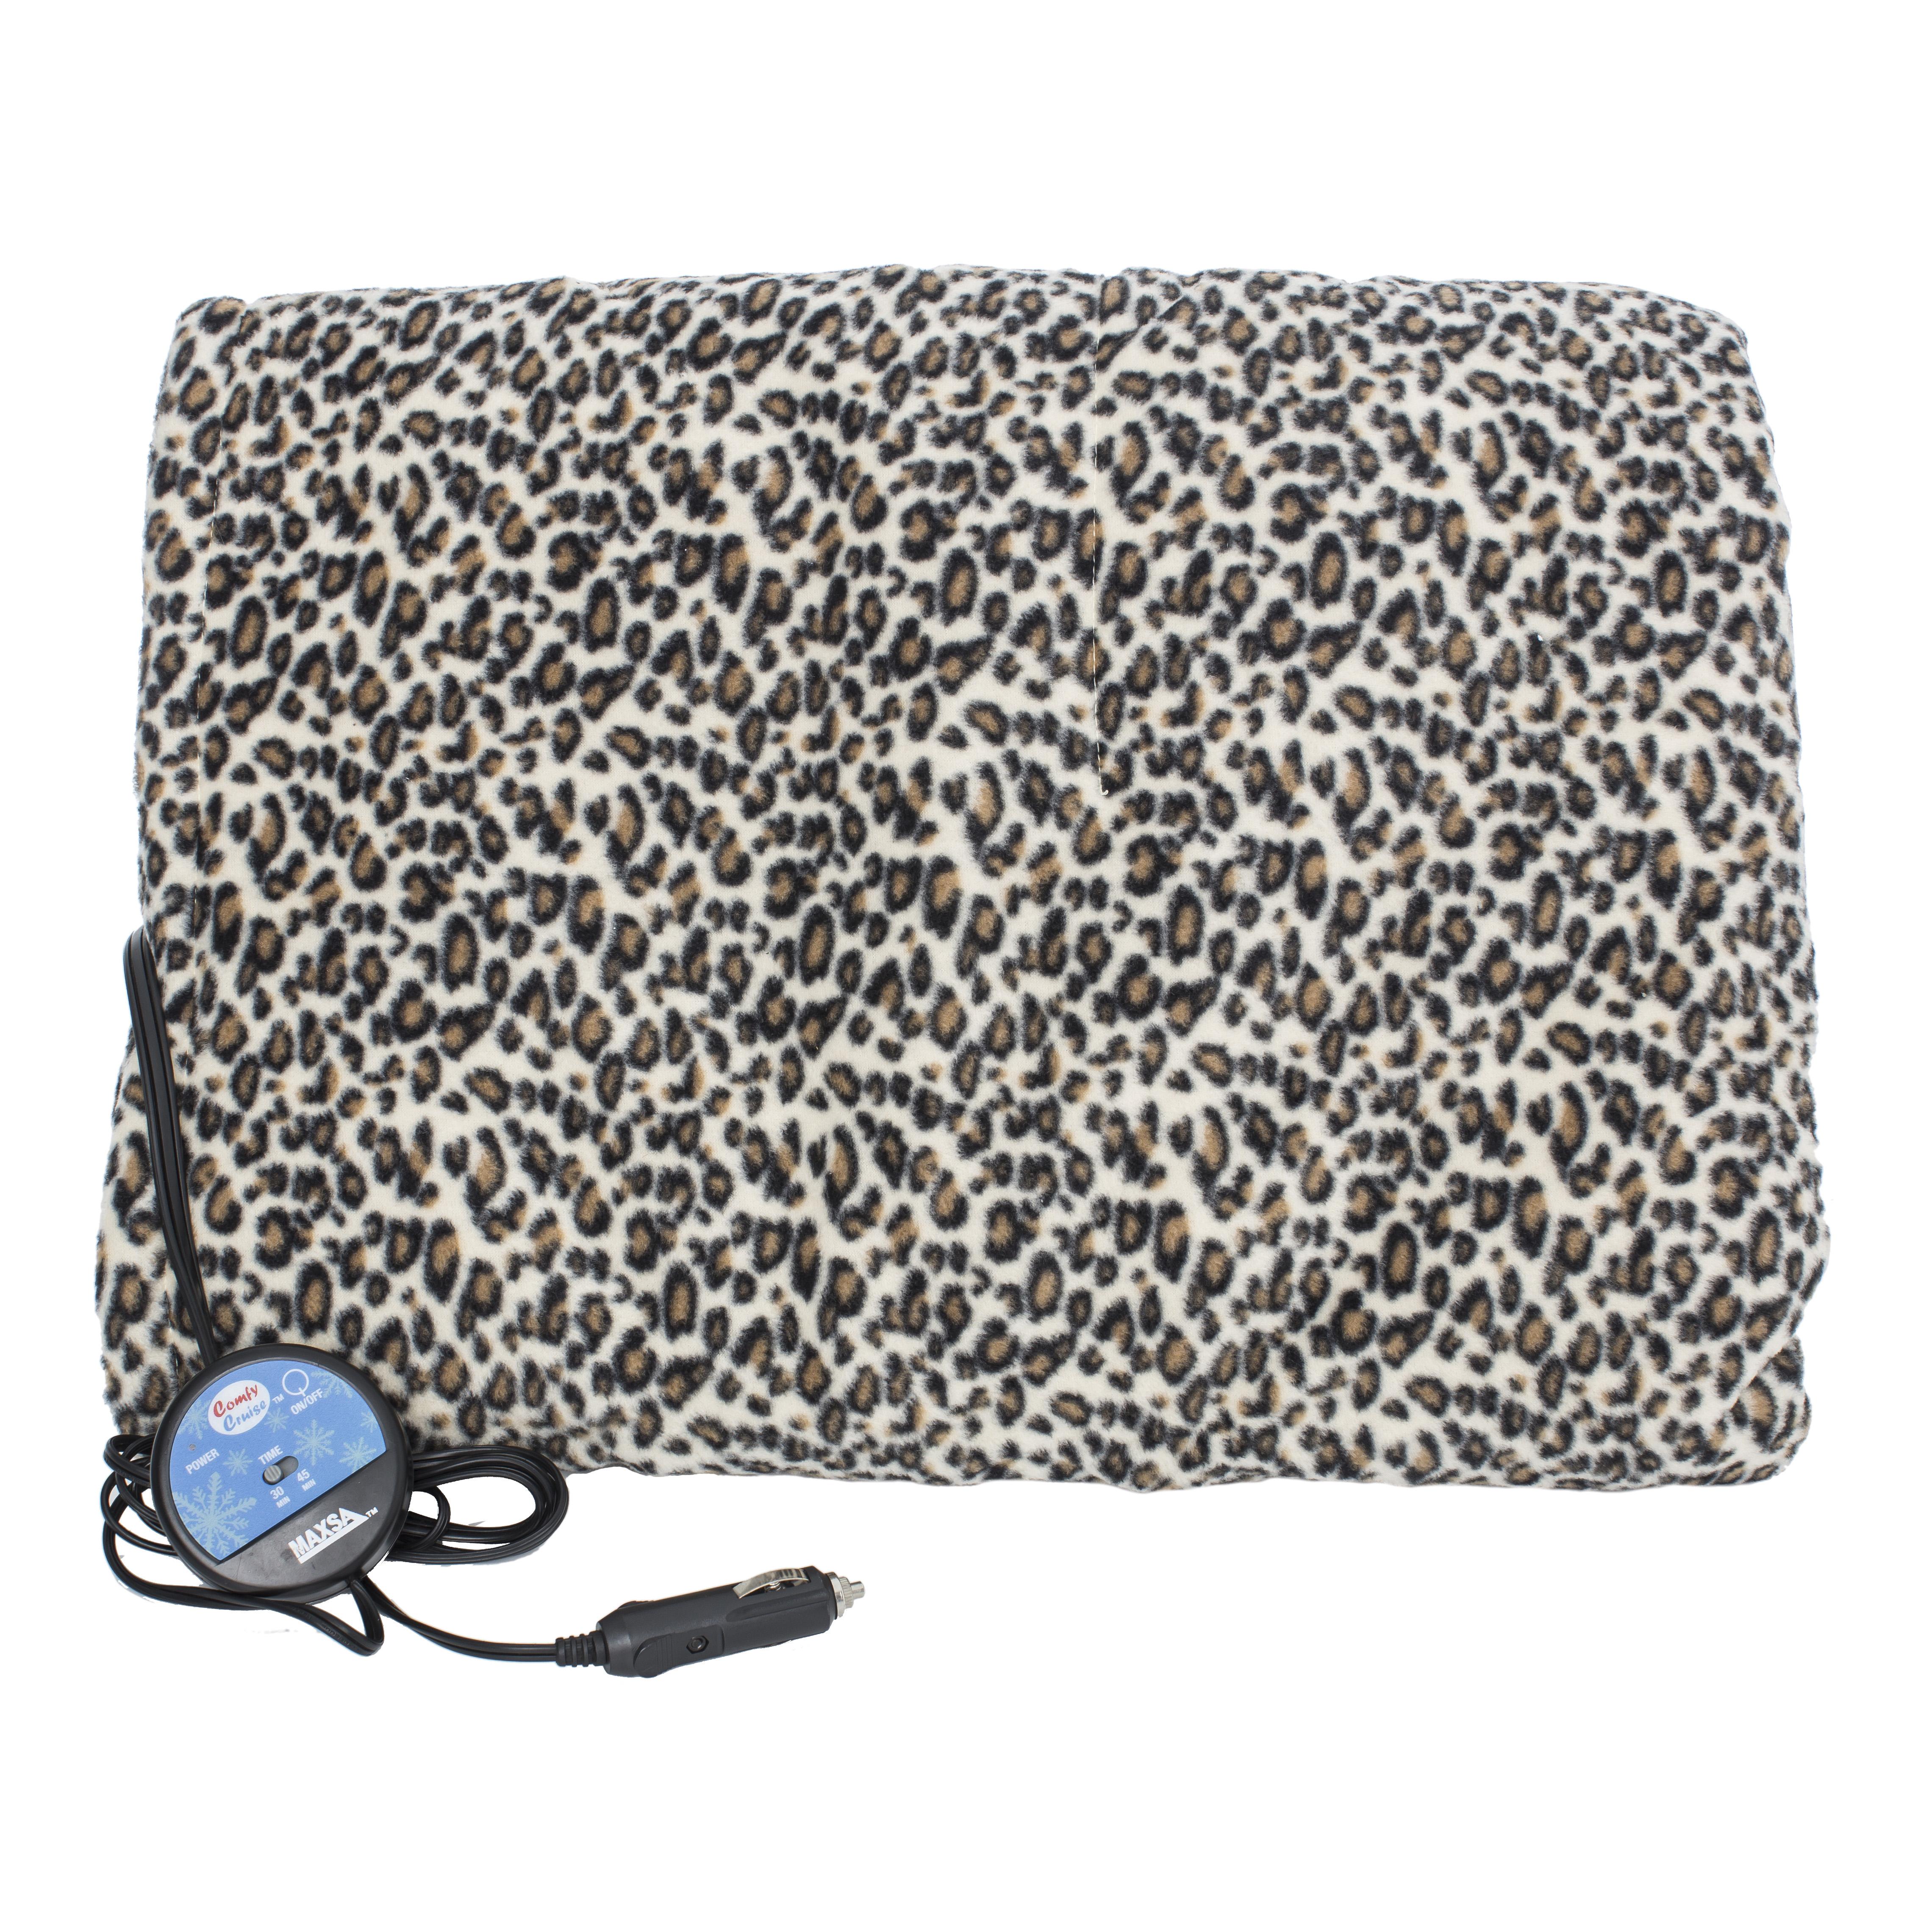 Maxsa Heated Car Blanket 20012 Leopard